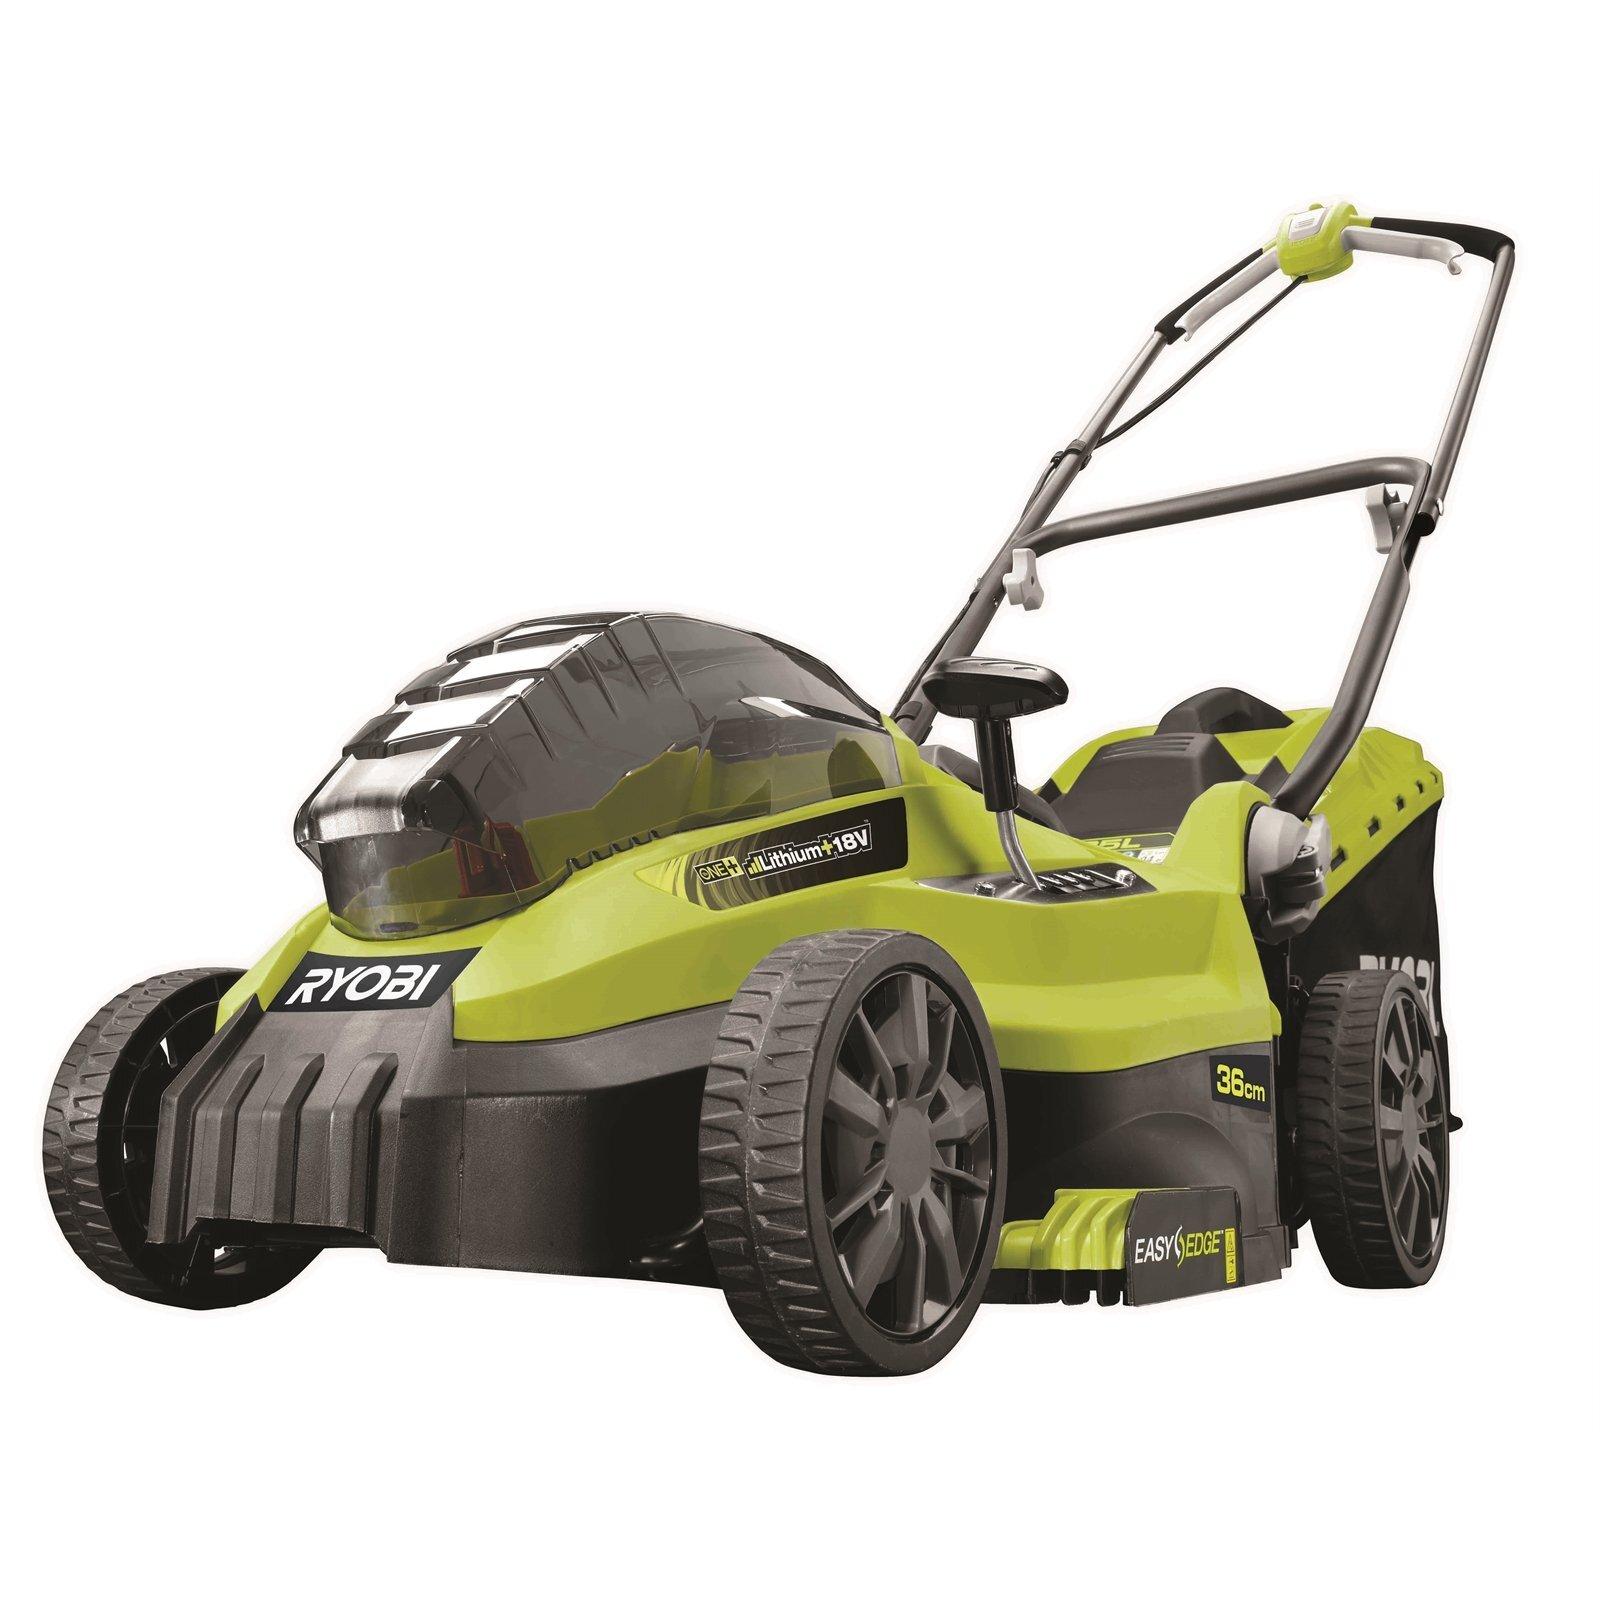 Ryobi One+ 18V 4.0Ah 36cm Lawn Mower Kit